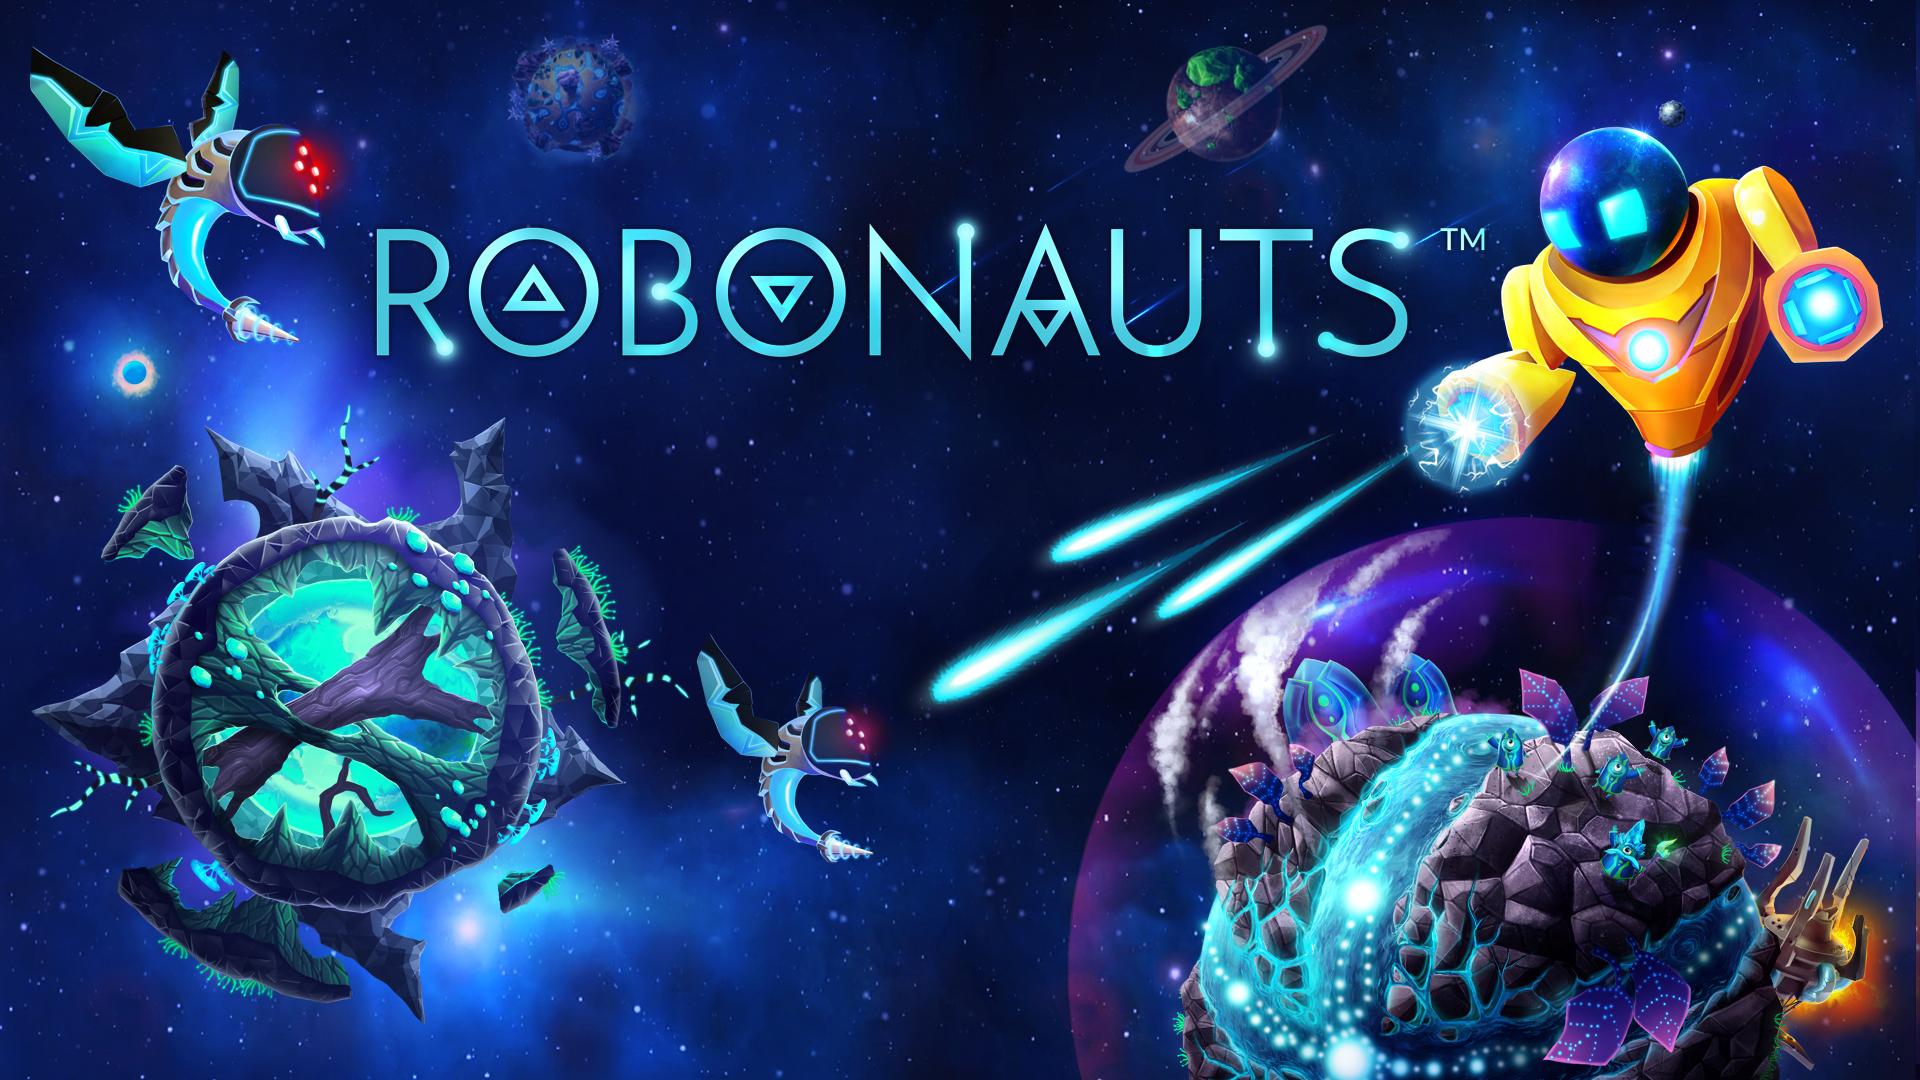 Robonauts [Nintendo Switch] @ Nintendo eShop